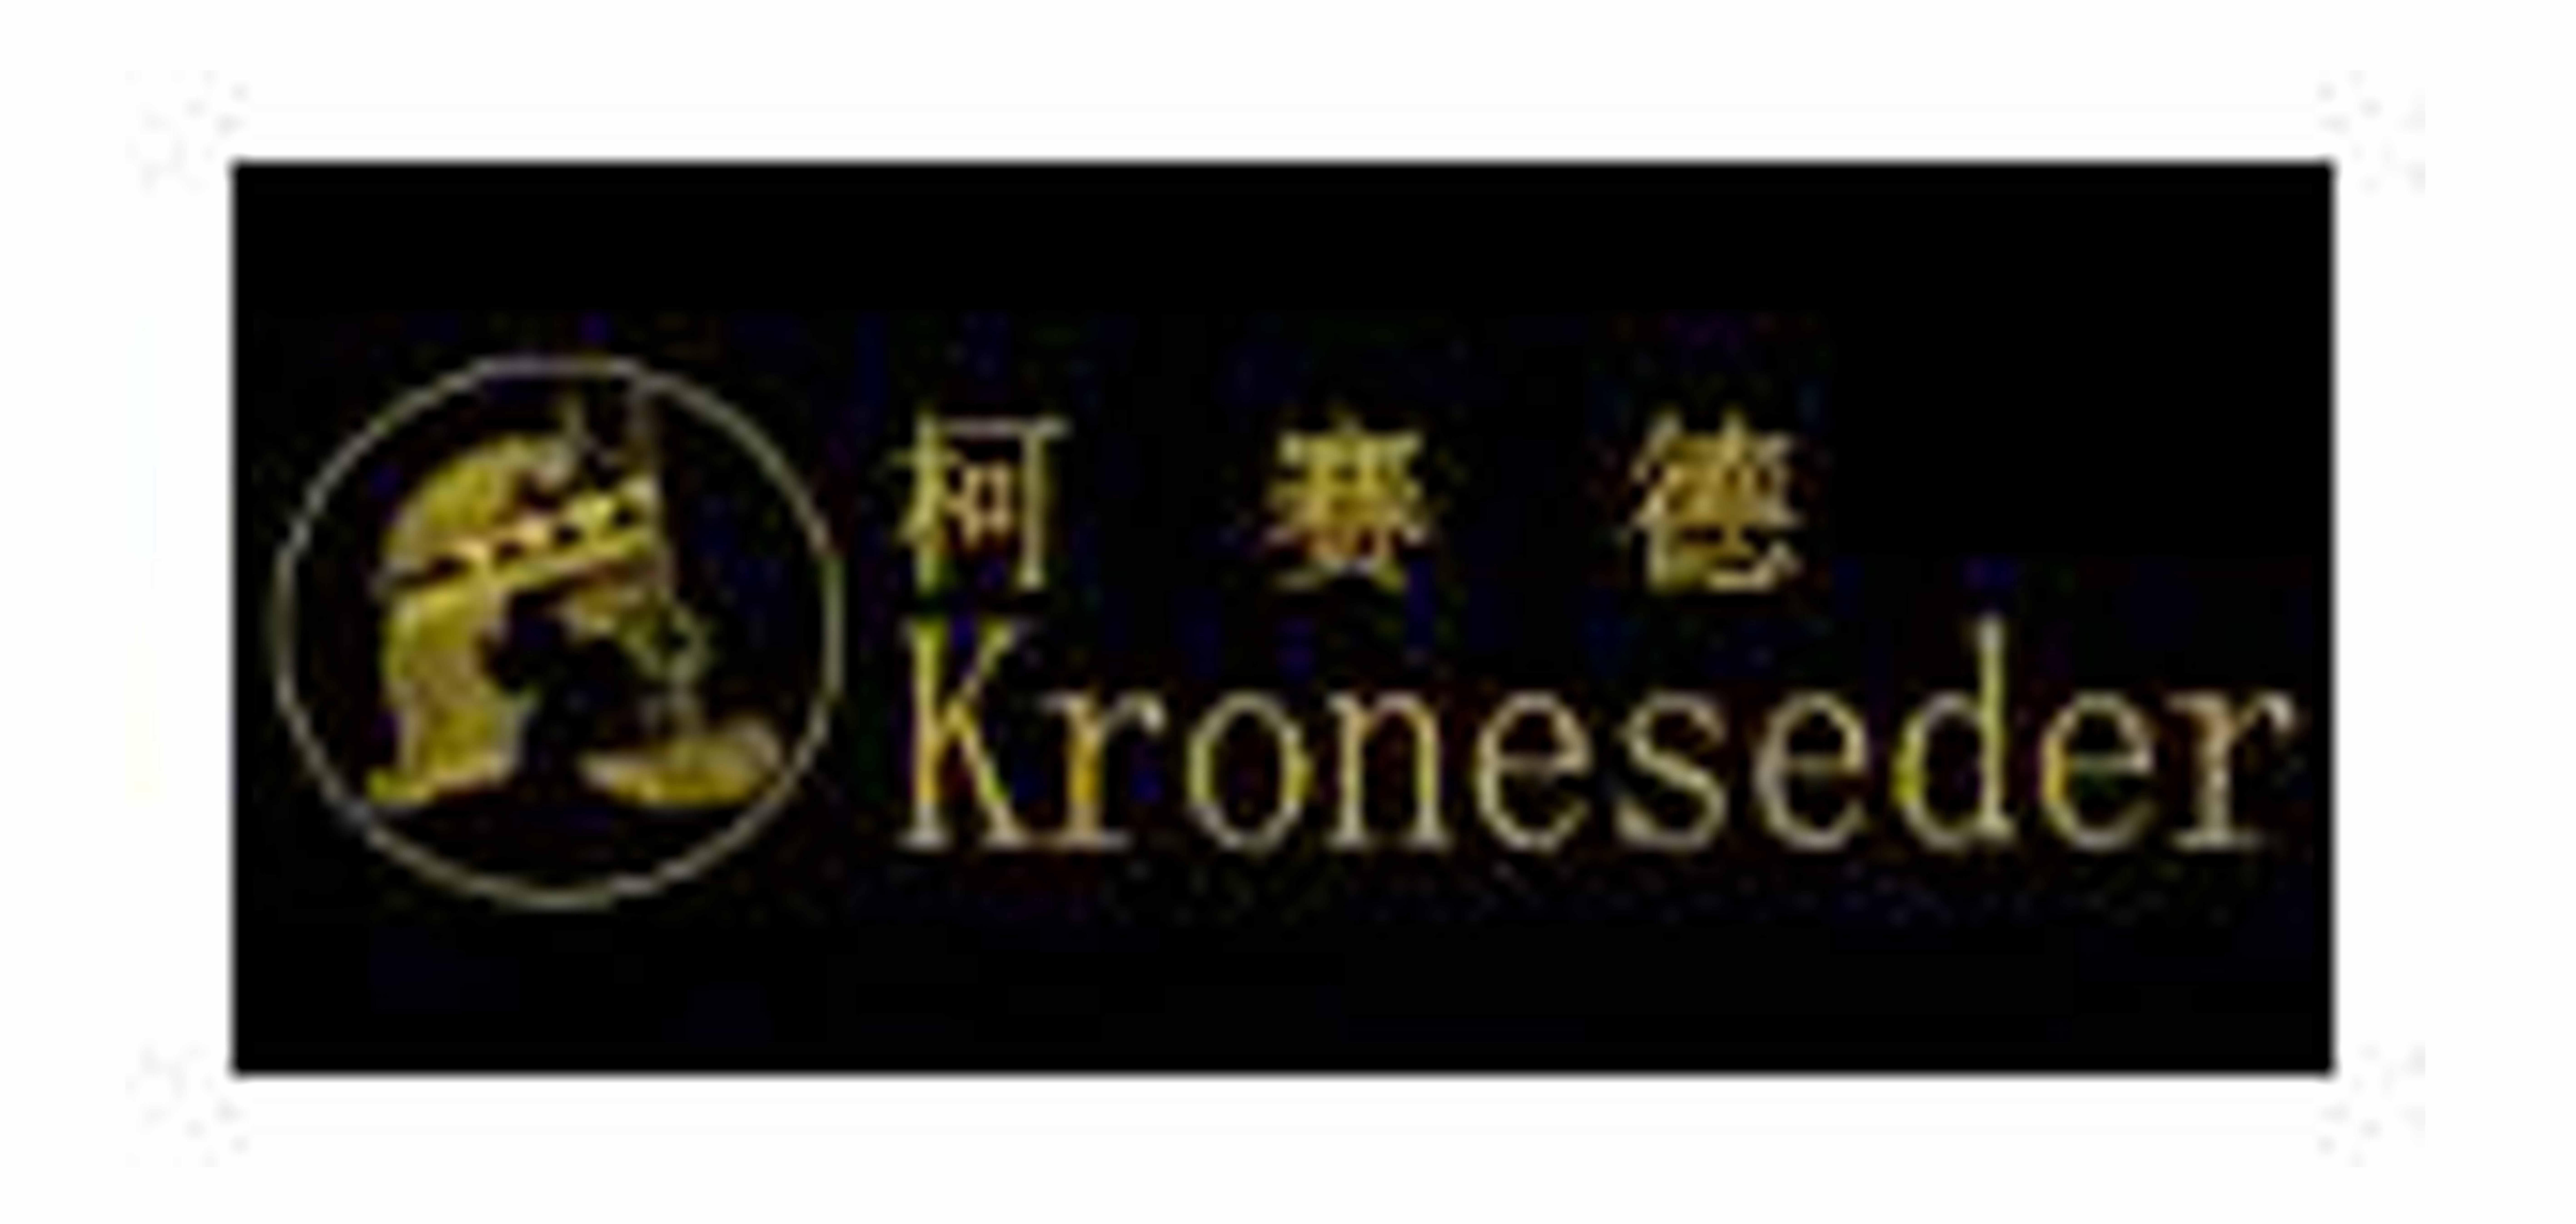 柯赛德/Kroneseder